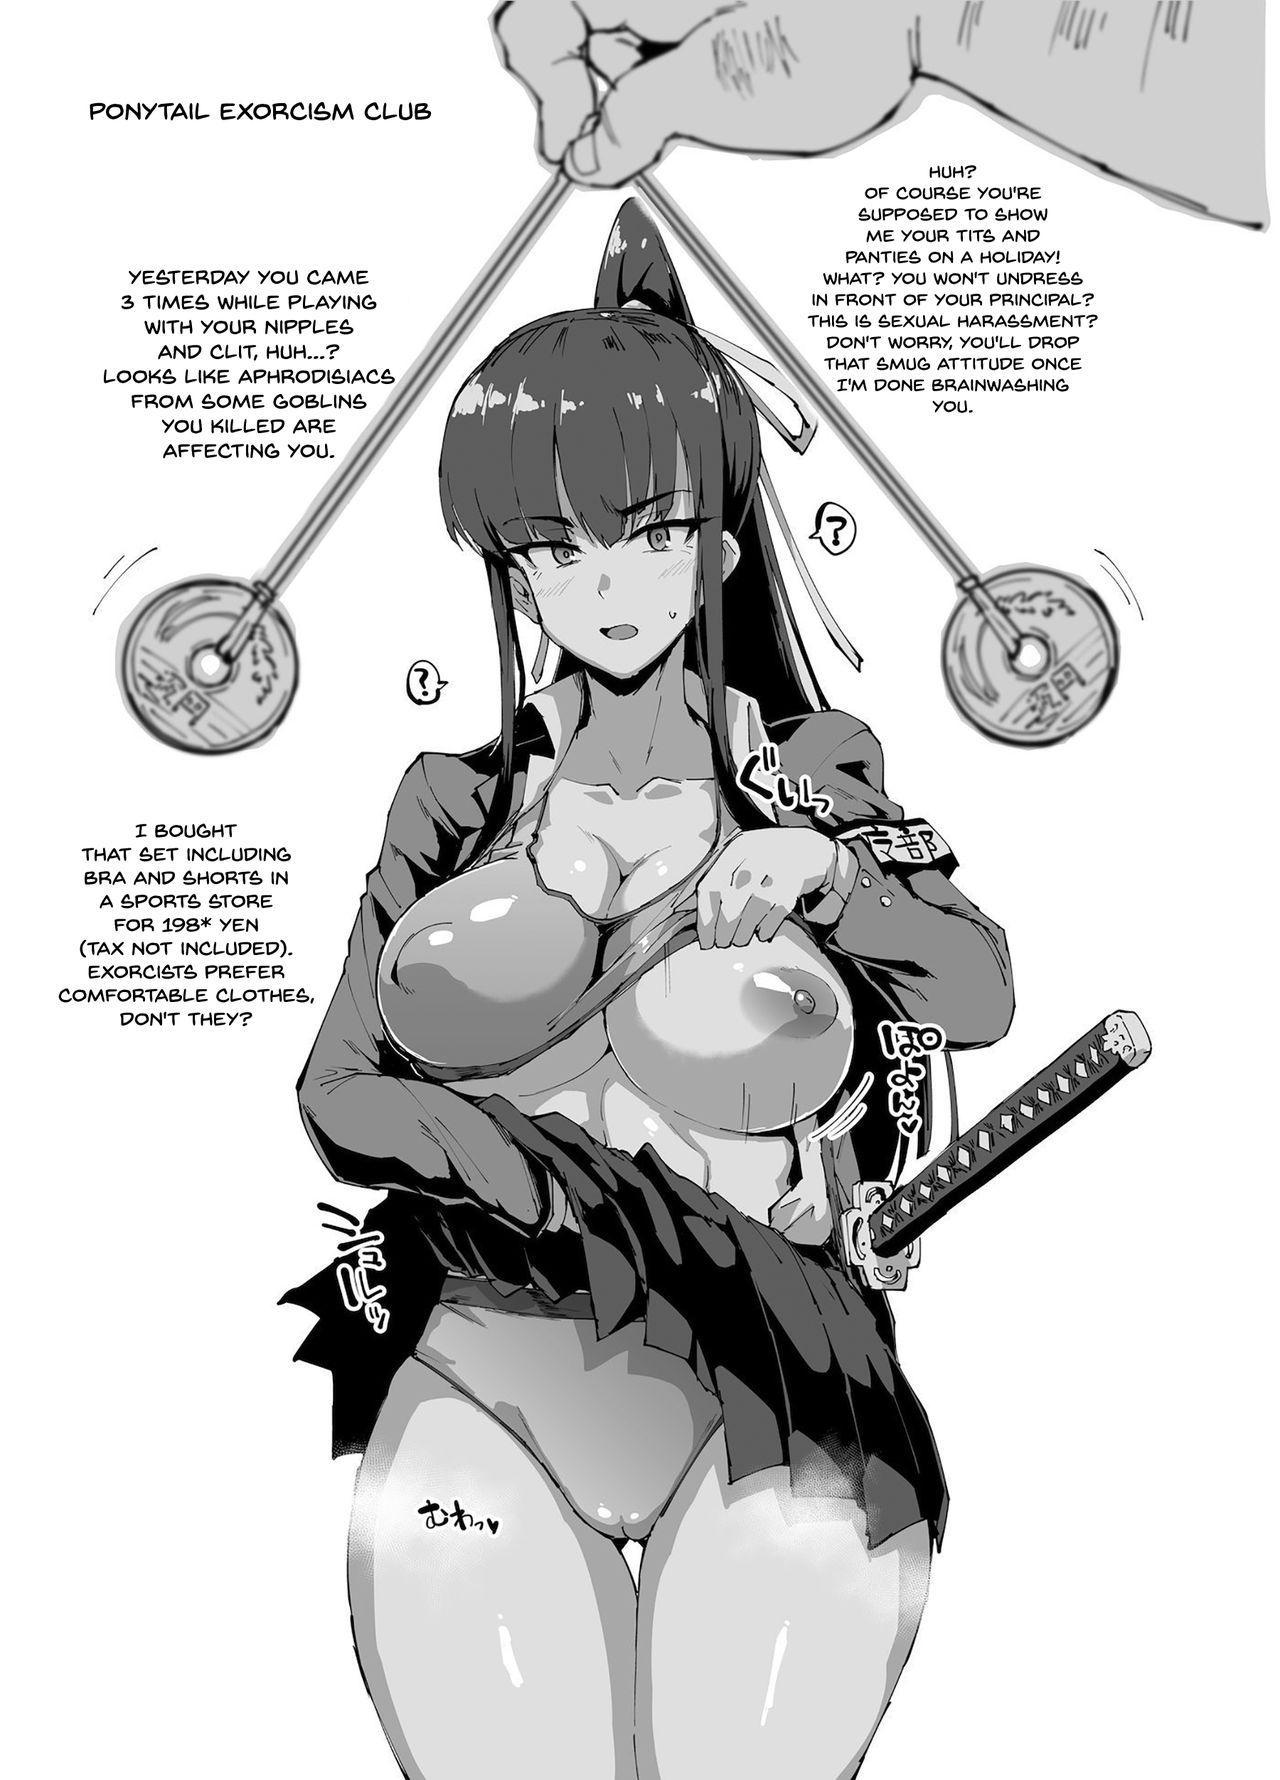 Kurokami Ponytail Tsurime JK Taimabu Rakugaki | Exorcism Club for Black Haired Girls with Ponytails 13